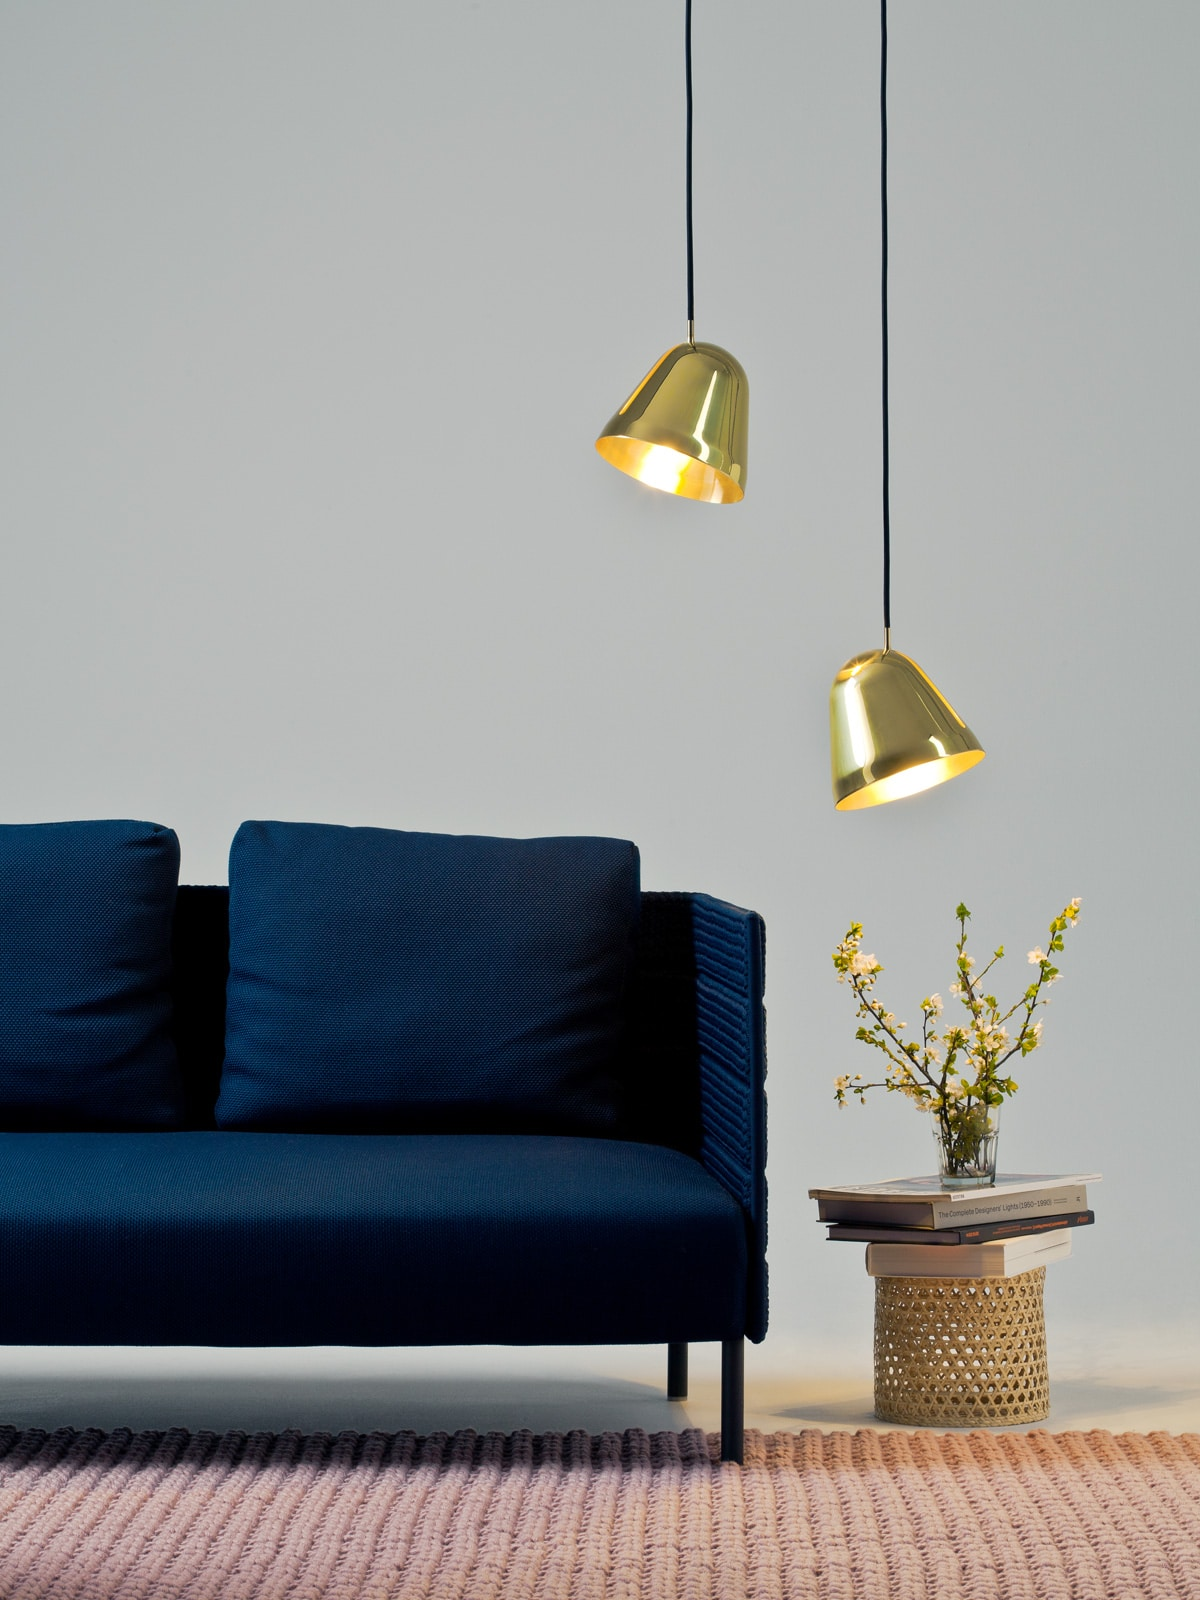 nyta designer h ngeleuchten wandleuchten designort. Black Bedroom Furniture Sets. Home Design Ideas